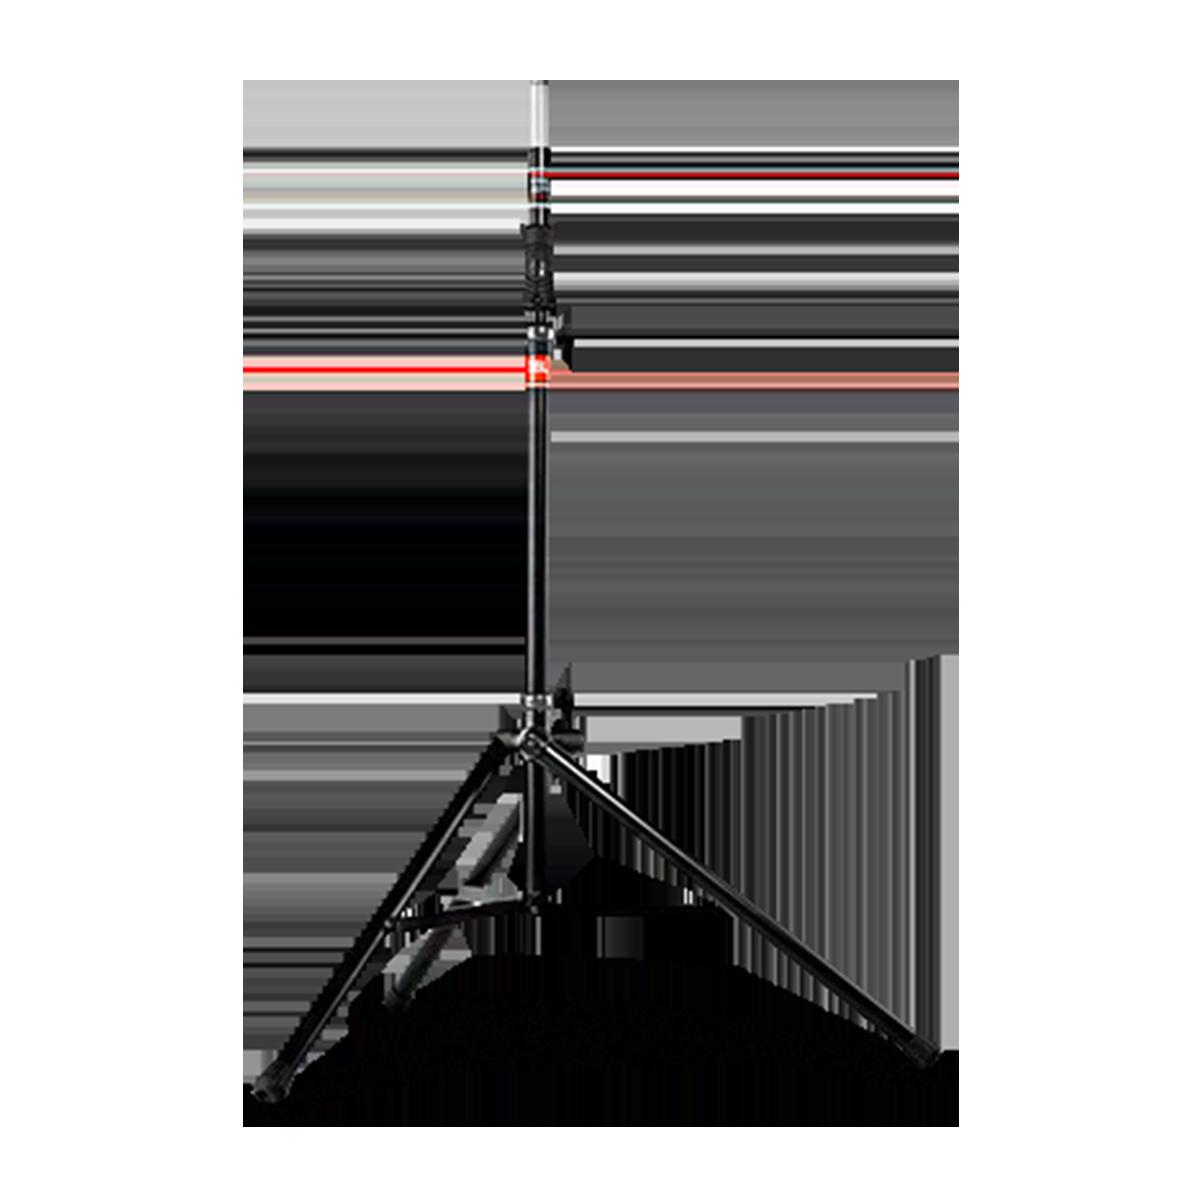 JBL Tripod Stand (Gas Assist) - Black - Lift-assist Aluminum Tripod Speaker Stand with Integrated Speaker Adapter - Hero